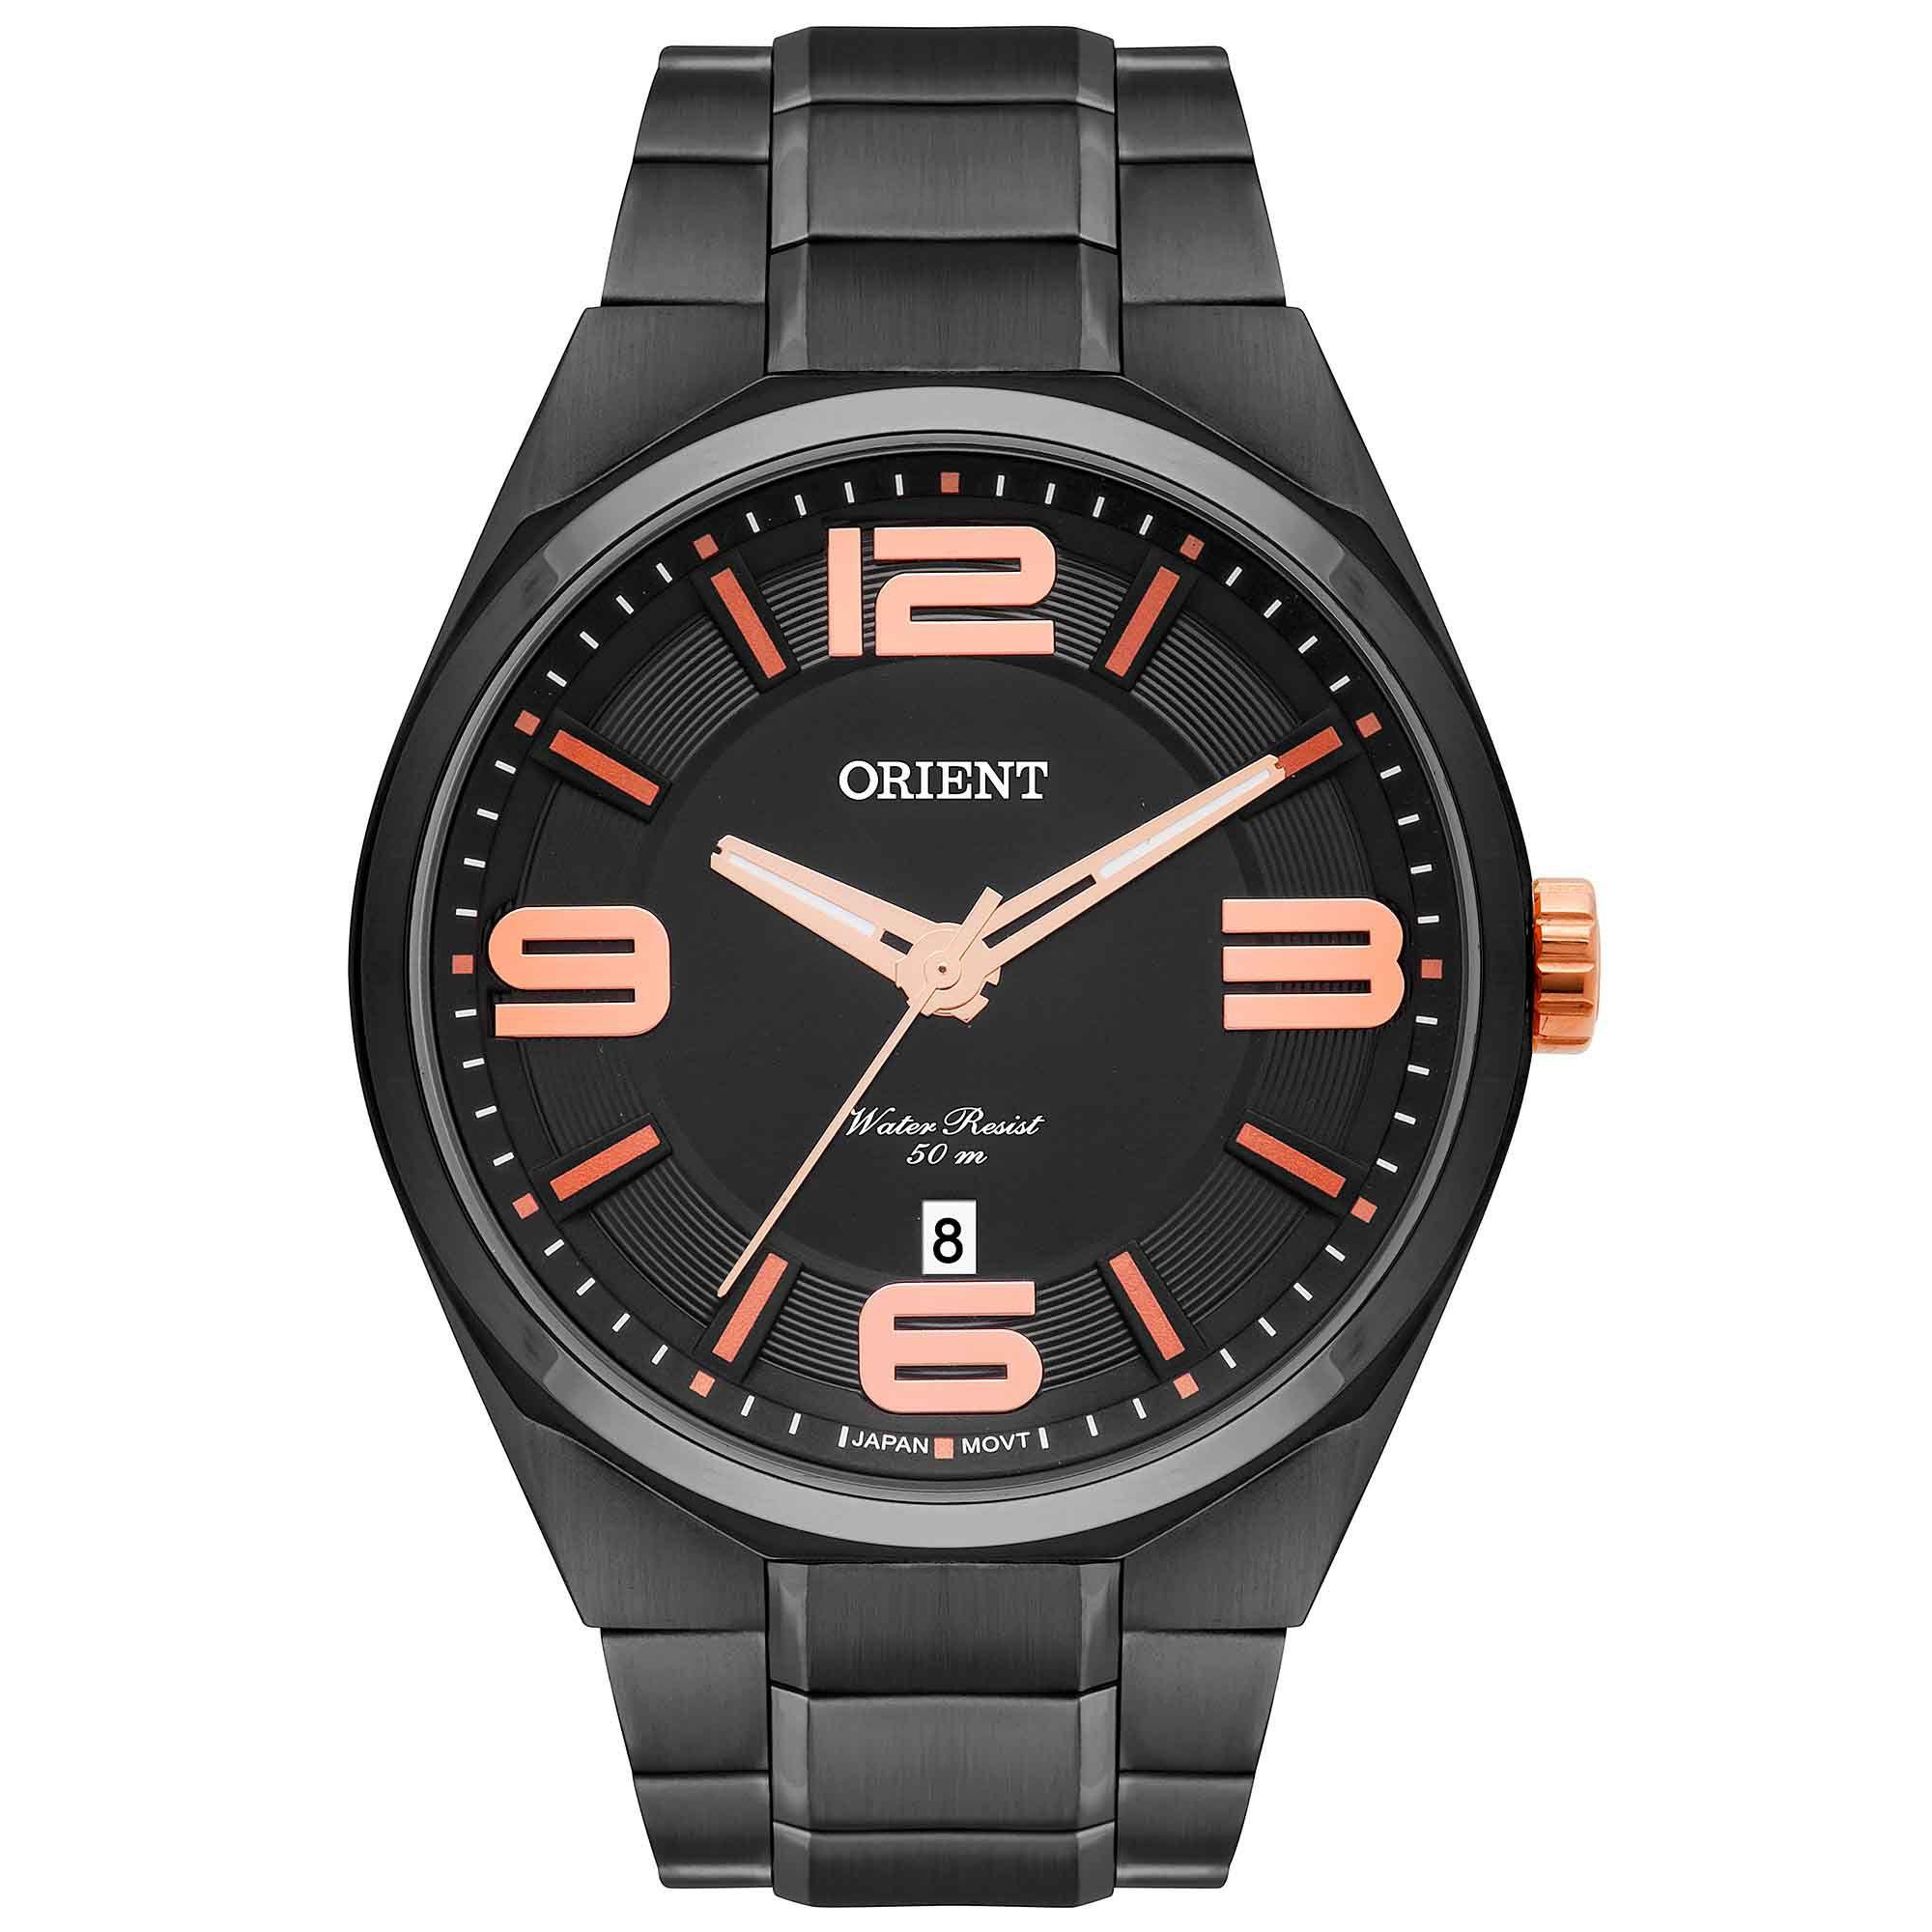 Relógio Masculino Orient MPSS1003 P2PX